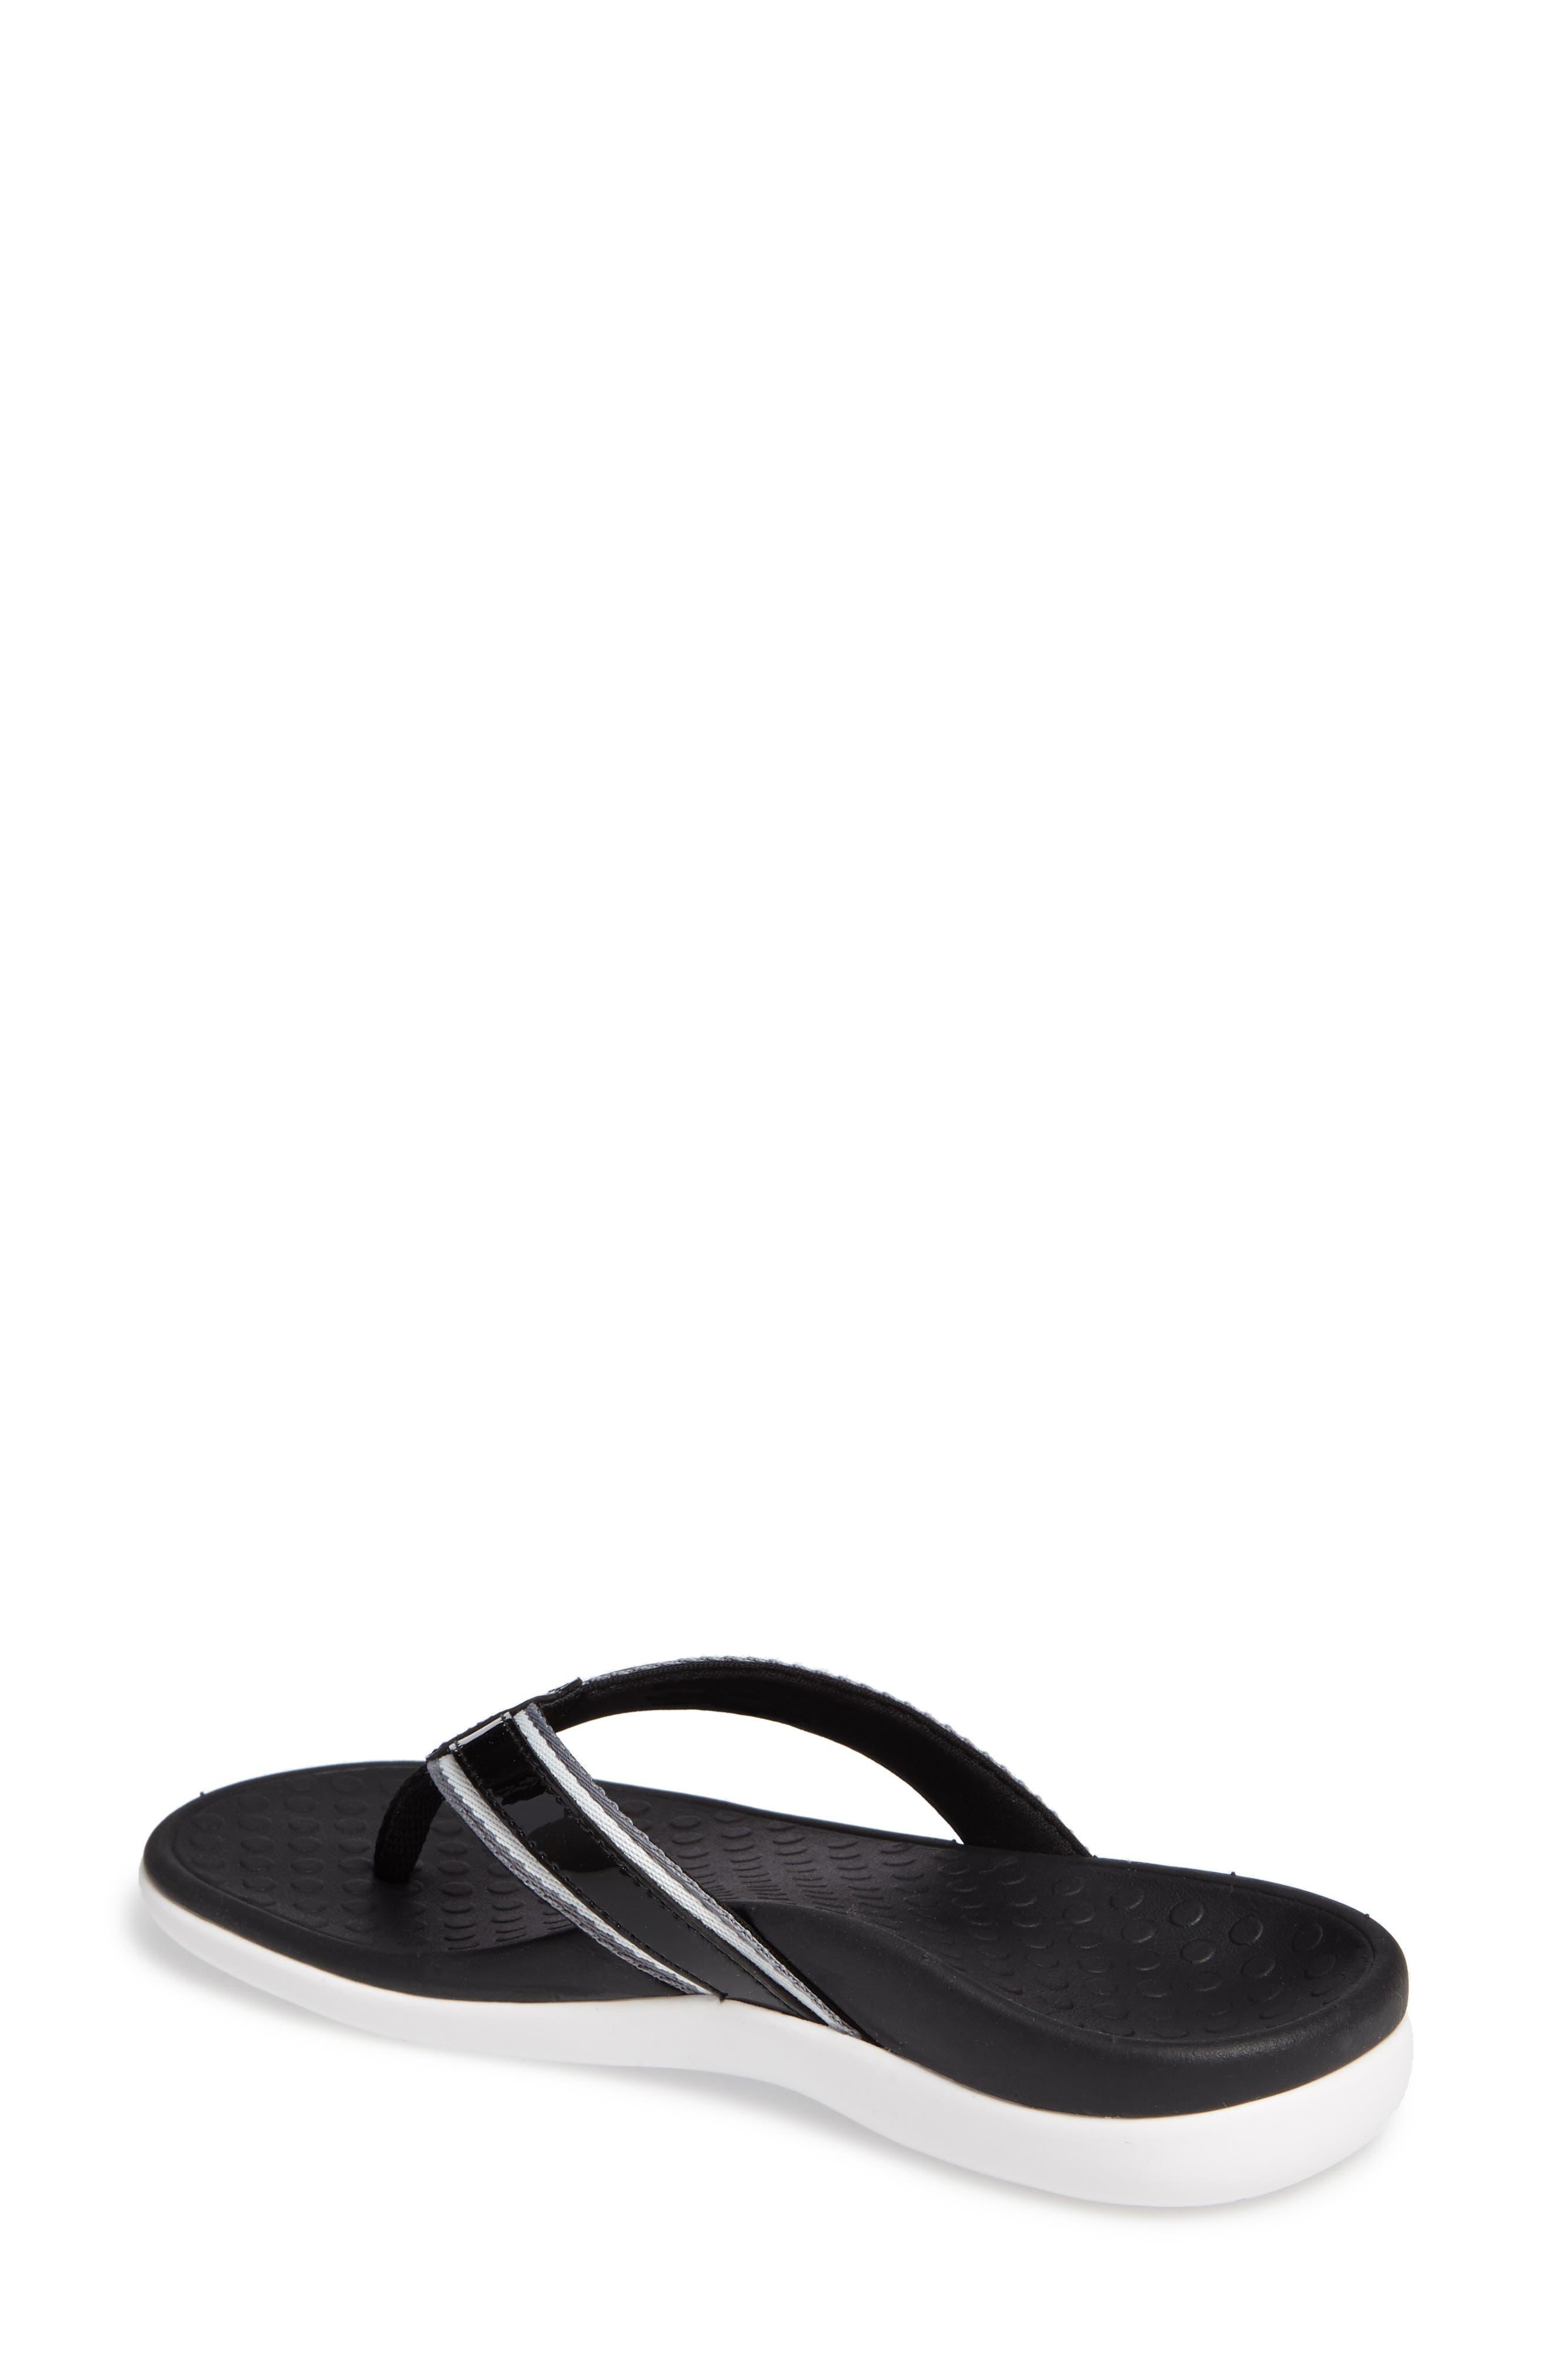 Tide Sport Flip Flop,                             Alternate thumbnail 2, color,                             Black Leather